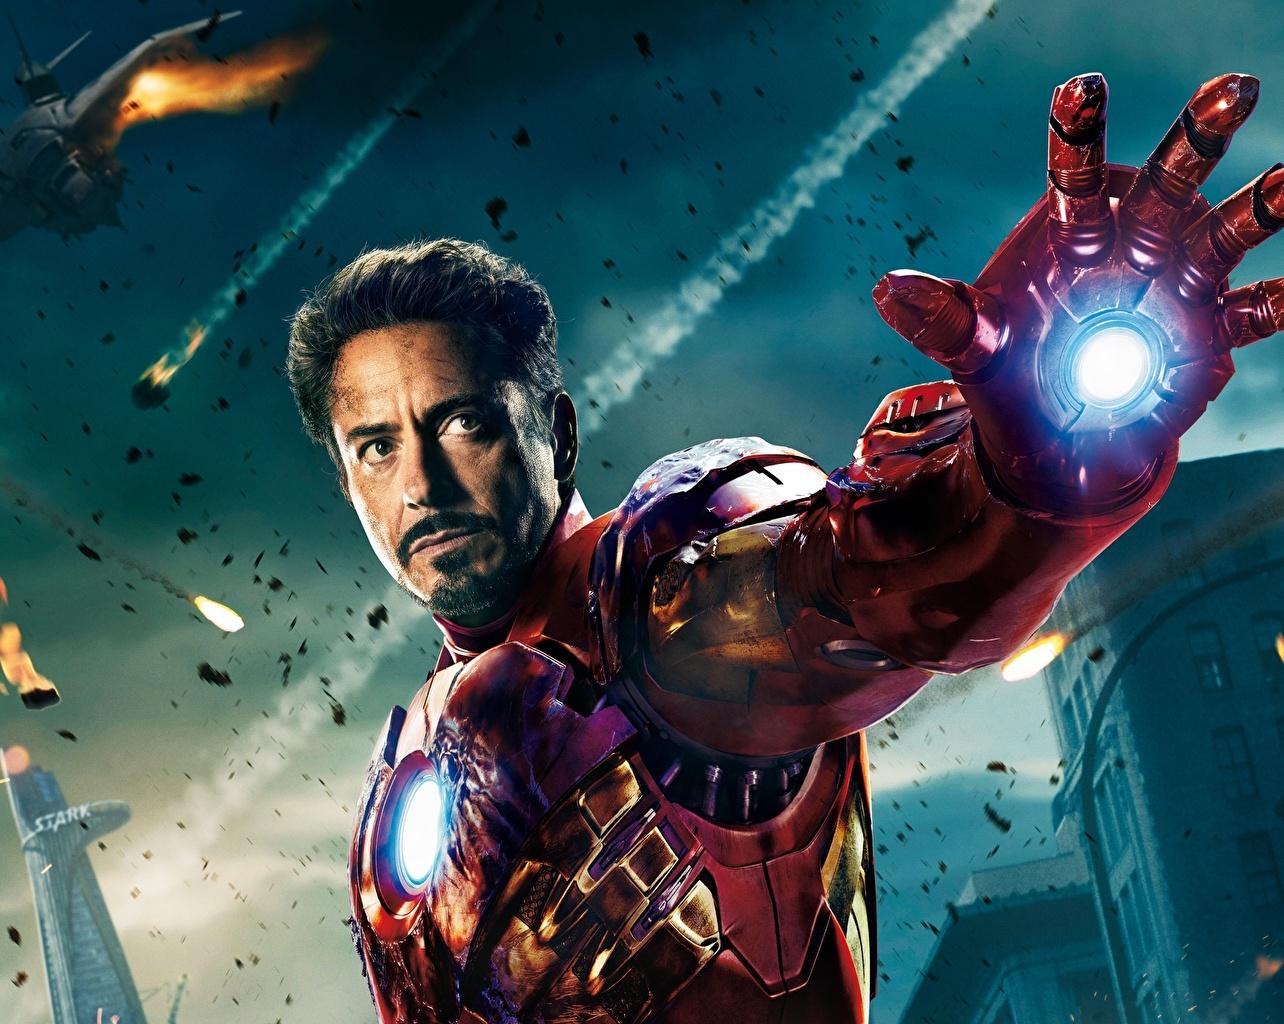 Images The Avengers (2012 film) Robert Downey Jr Iron Man